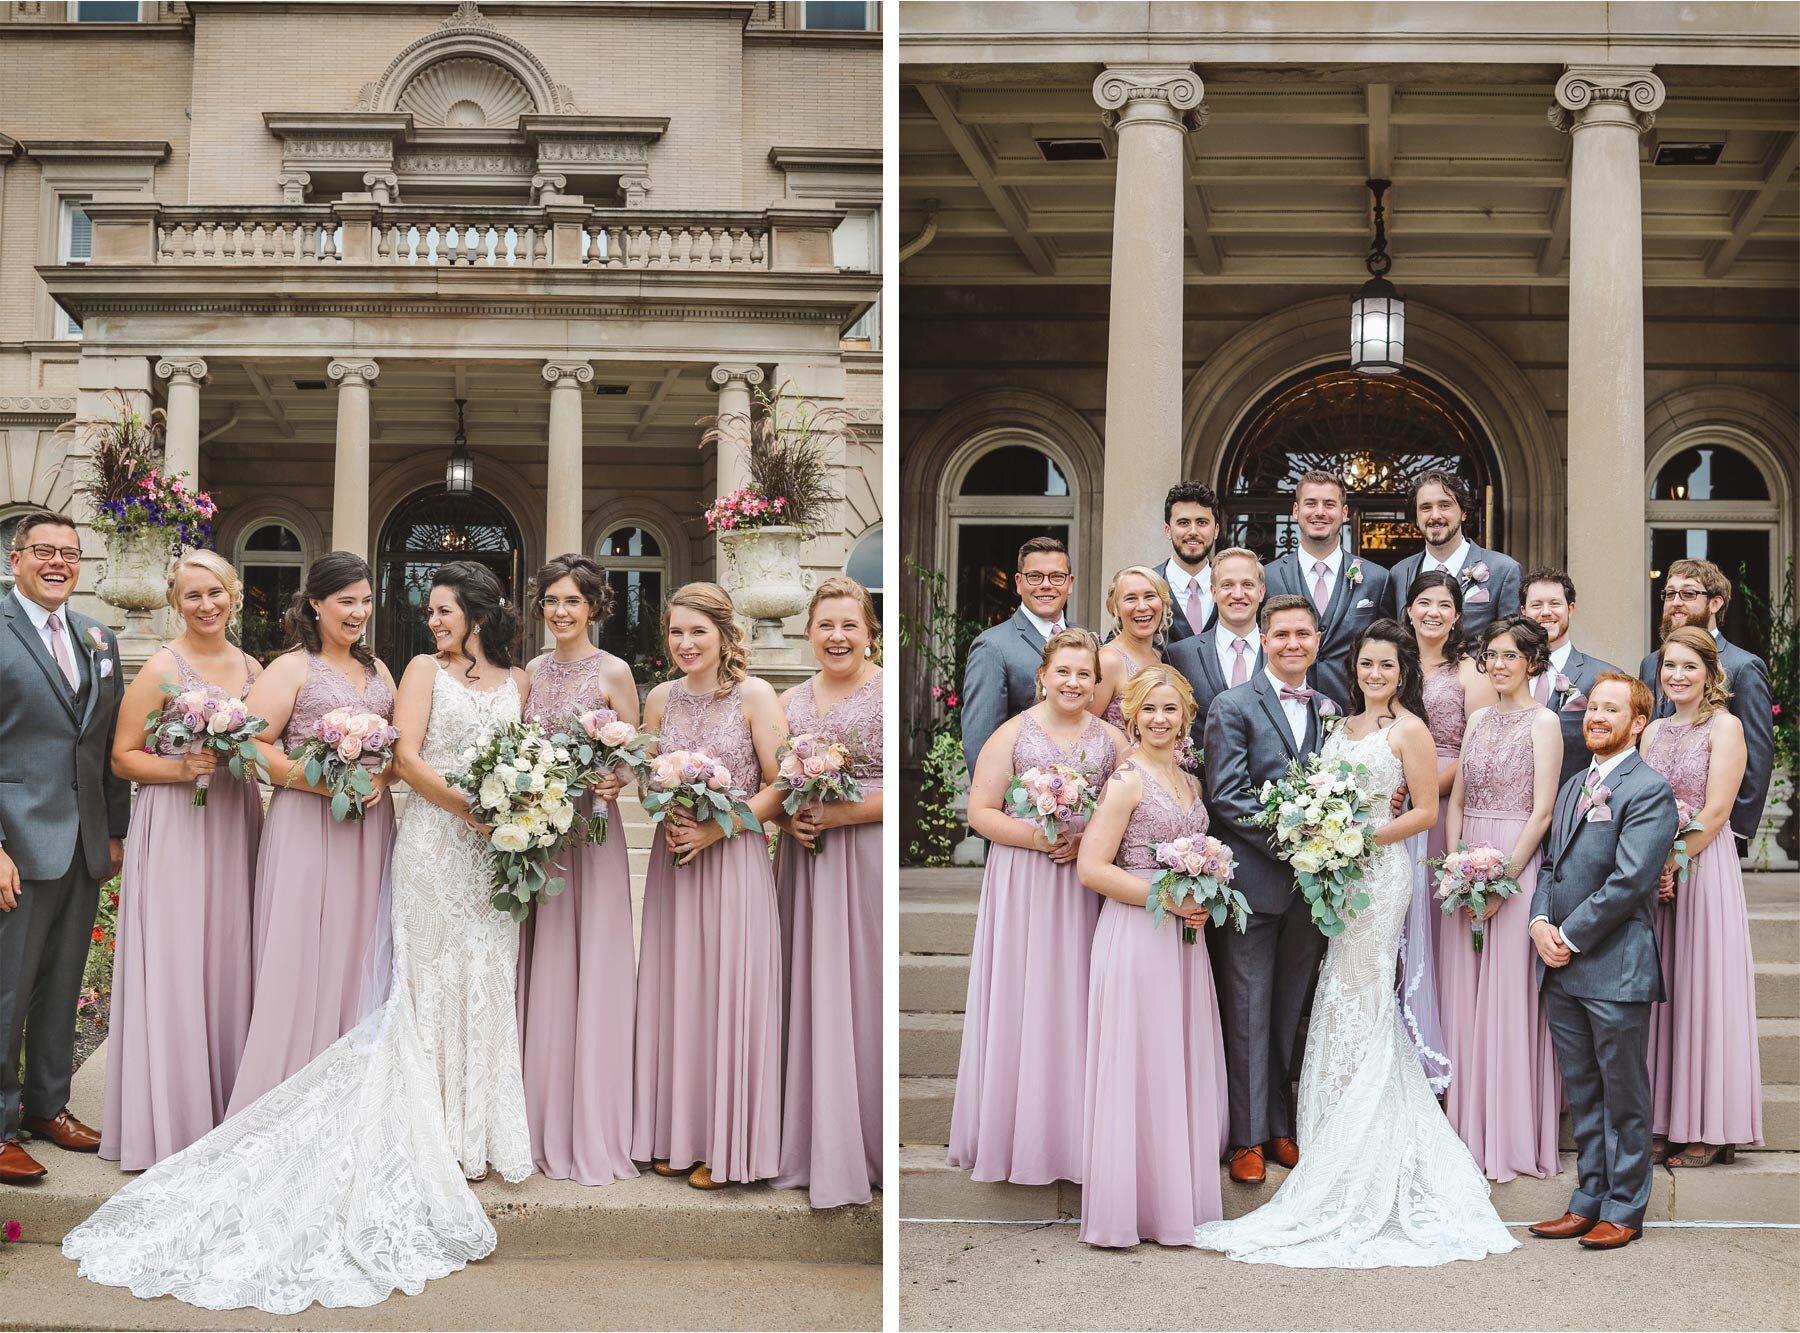 06-Wedding-by-Vick-Photography-Minneapolis-Minnesota-Semple-Mansion-Historic-Venue-Bridesmaids-Groomsmen-Kaitlyn-and-Nate.jpg